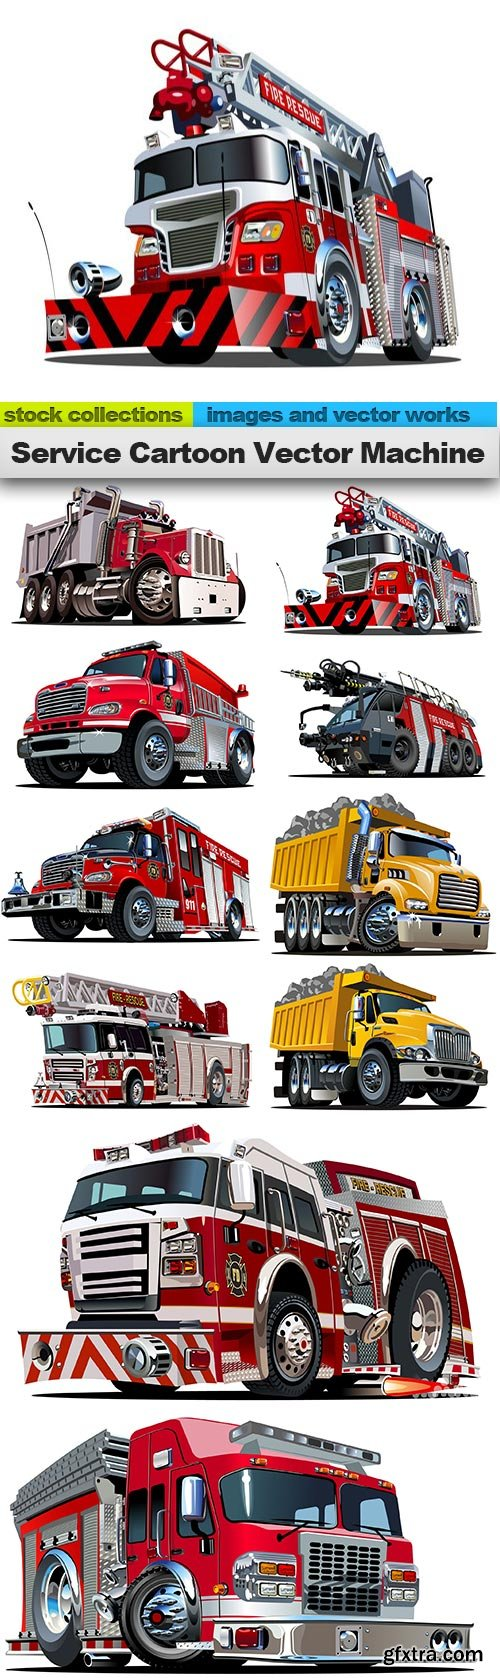 Service Cartoon Vector Machine, 10 x EPS